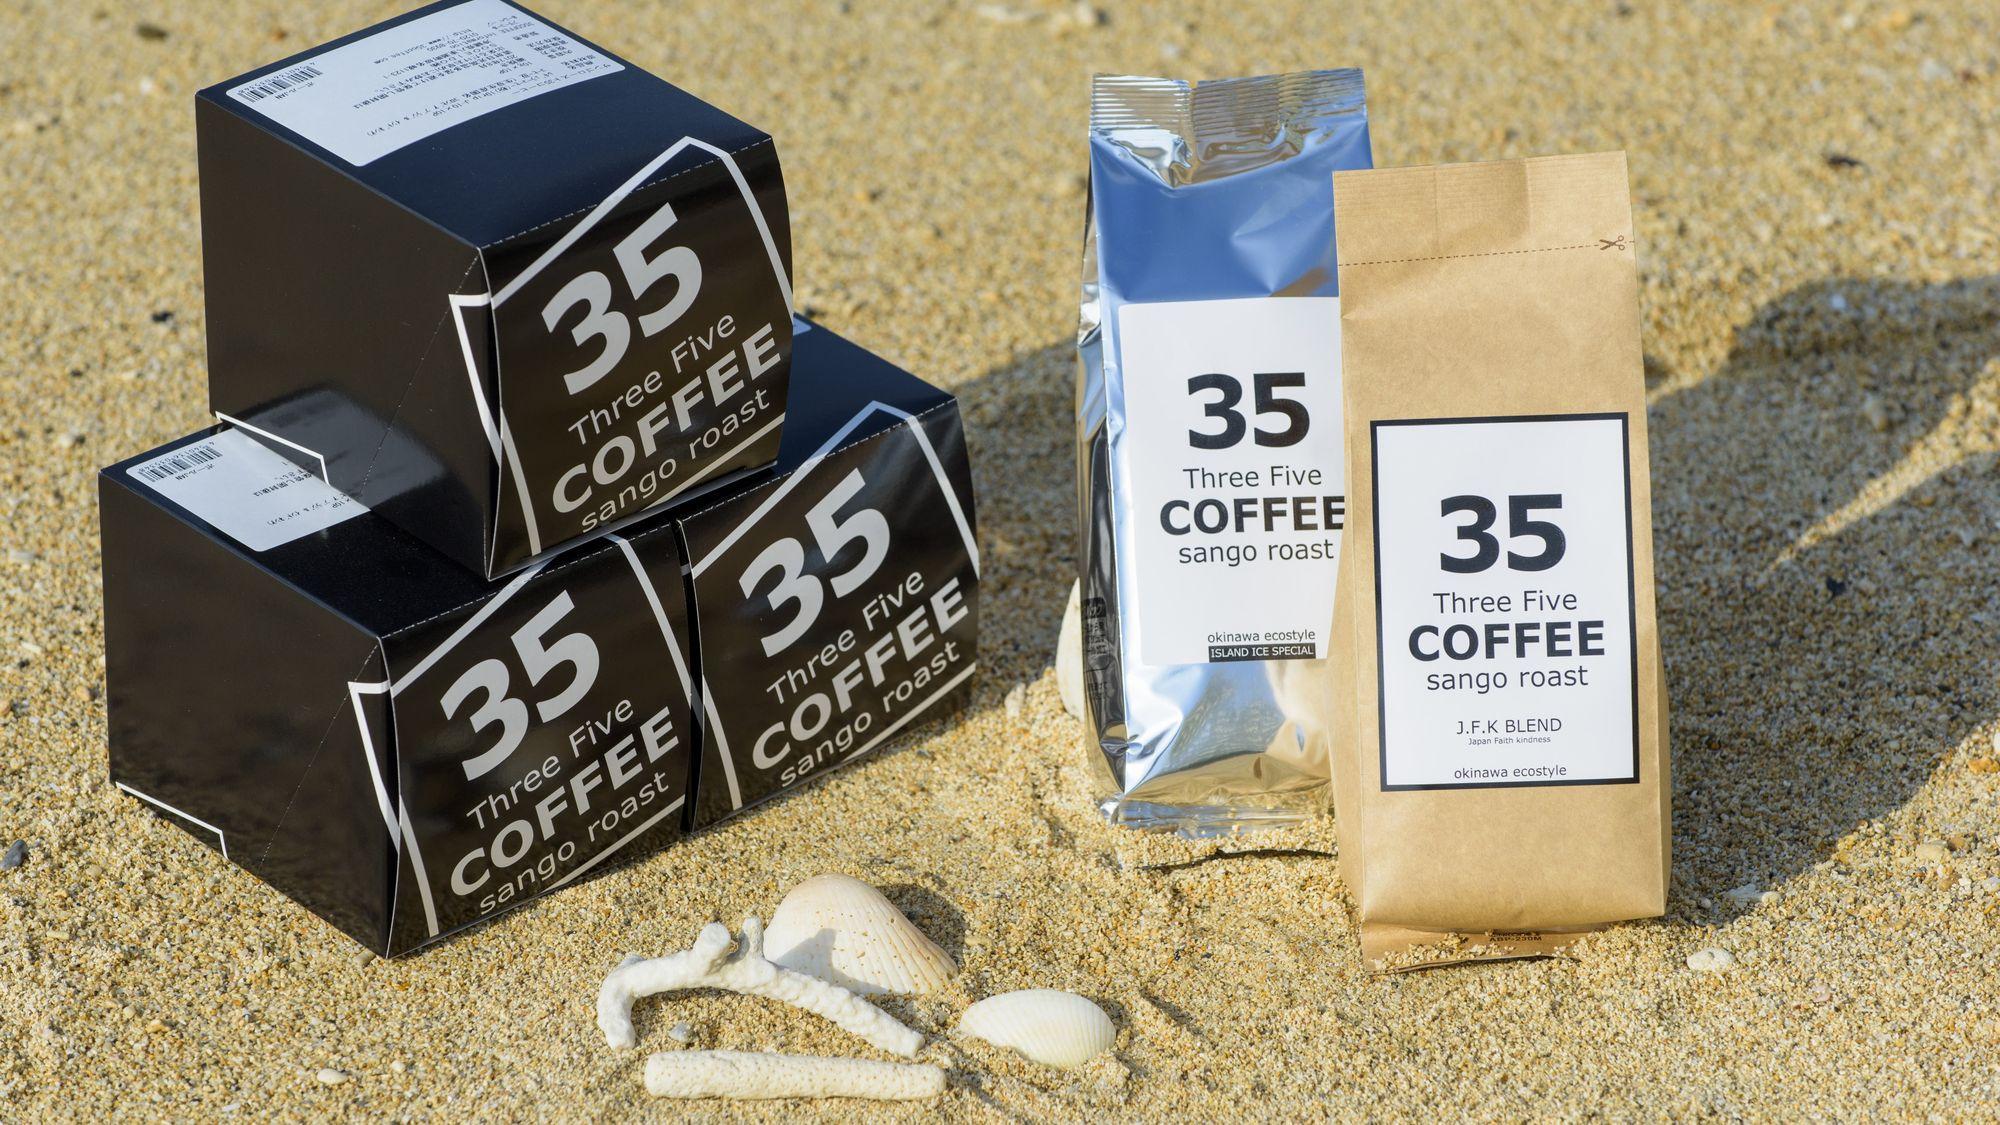 35COFFEEコーヒー豆